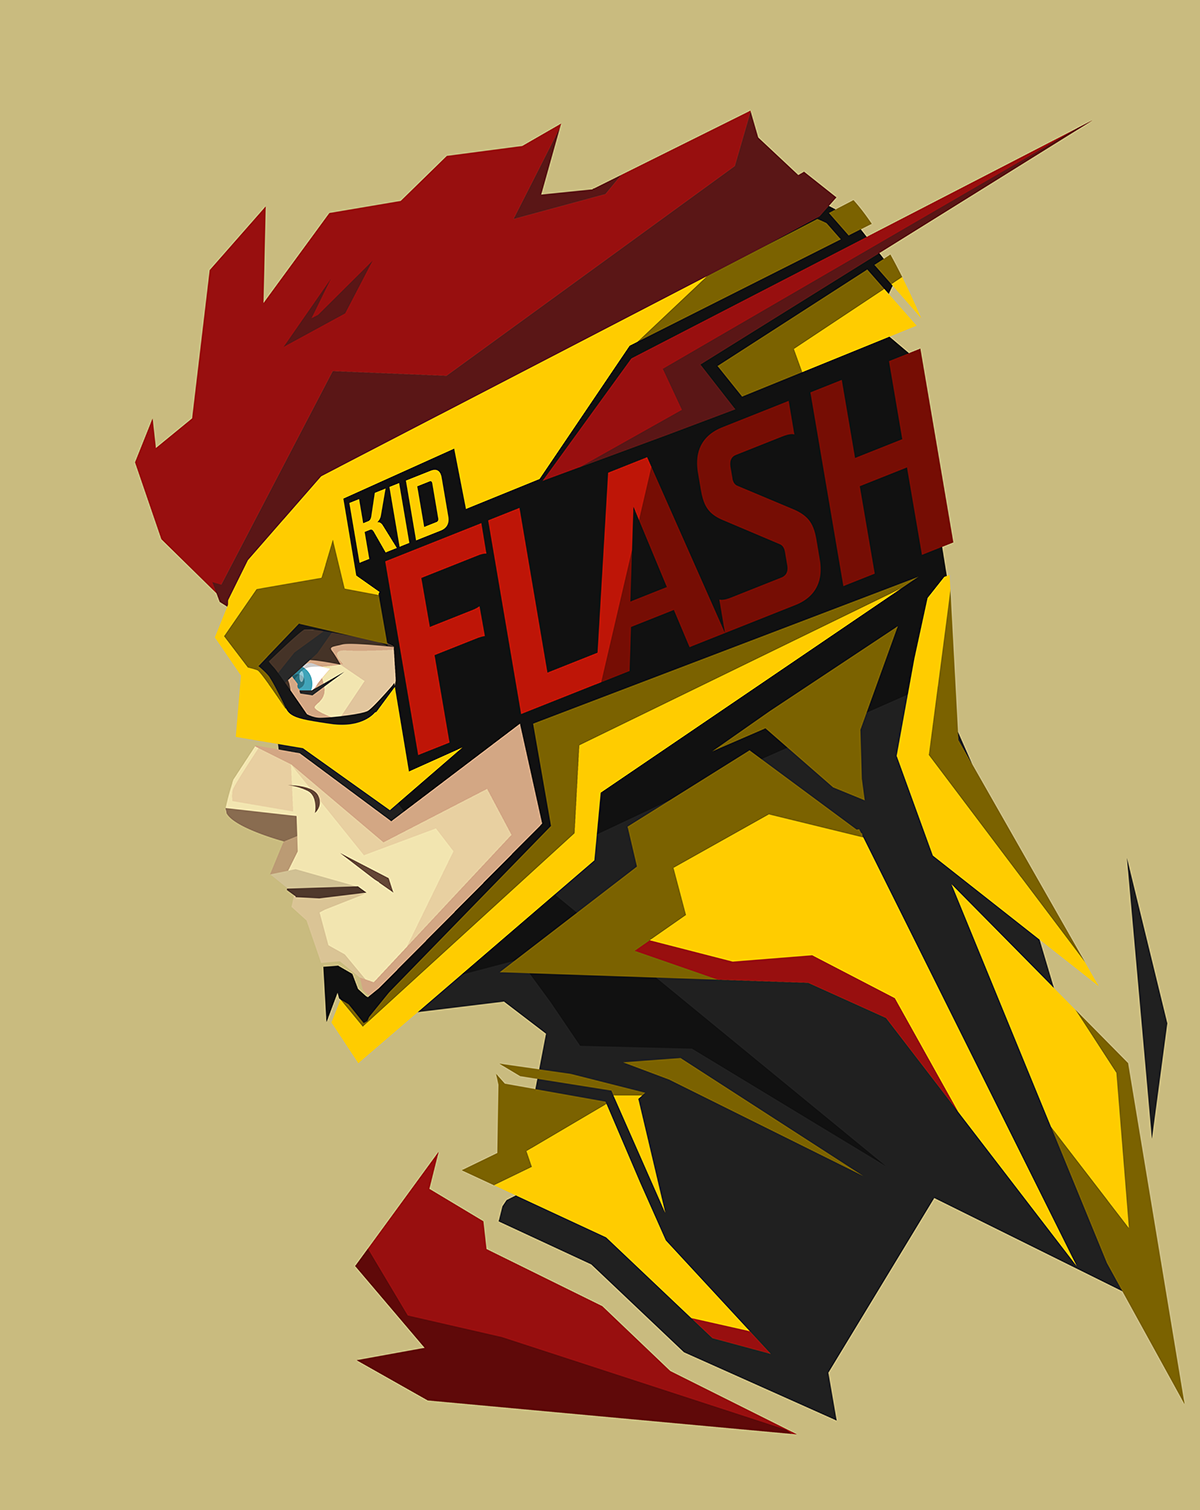 25b92737661063 5747a48a58574 Png 1200 1510 Kid Flash Comics Dc Comics Characters